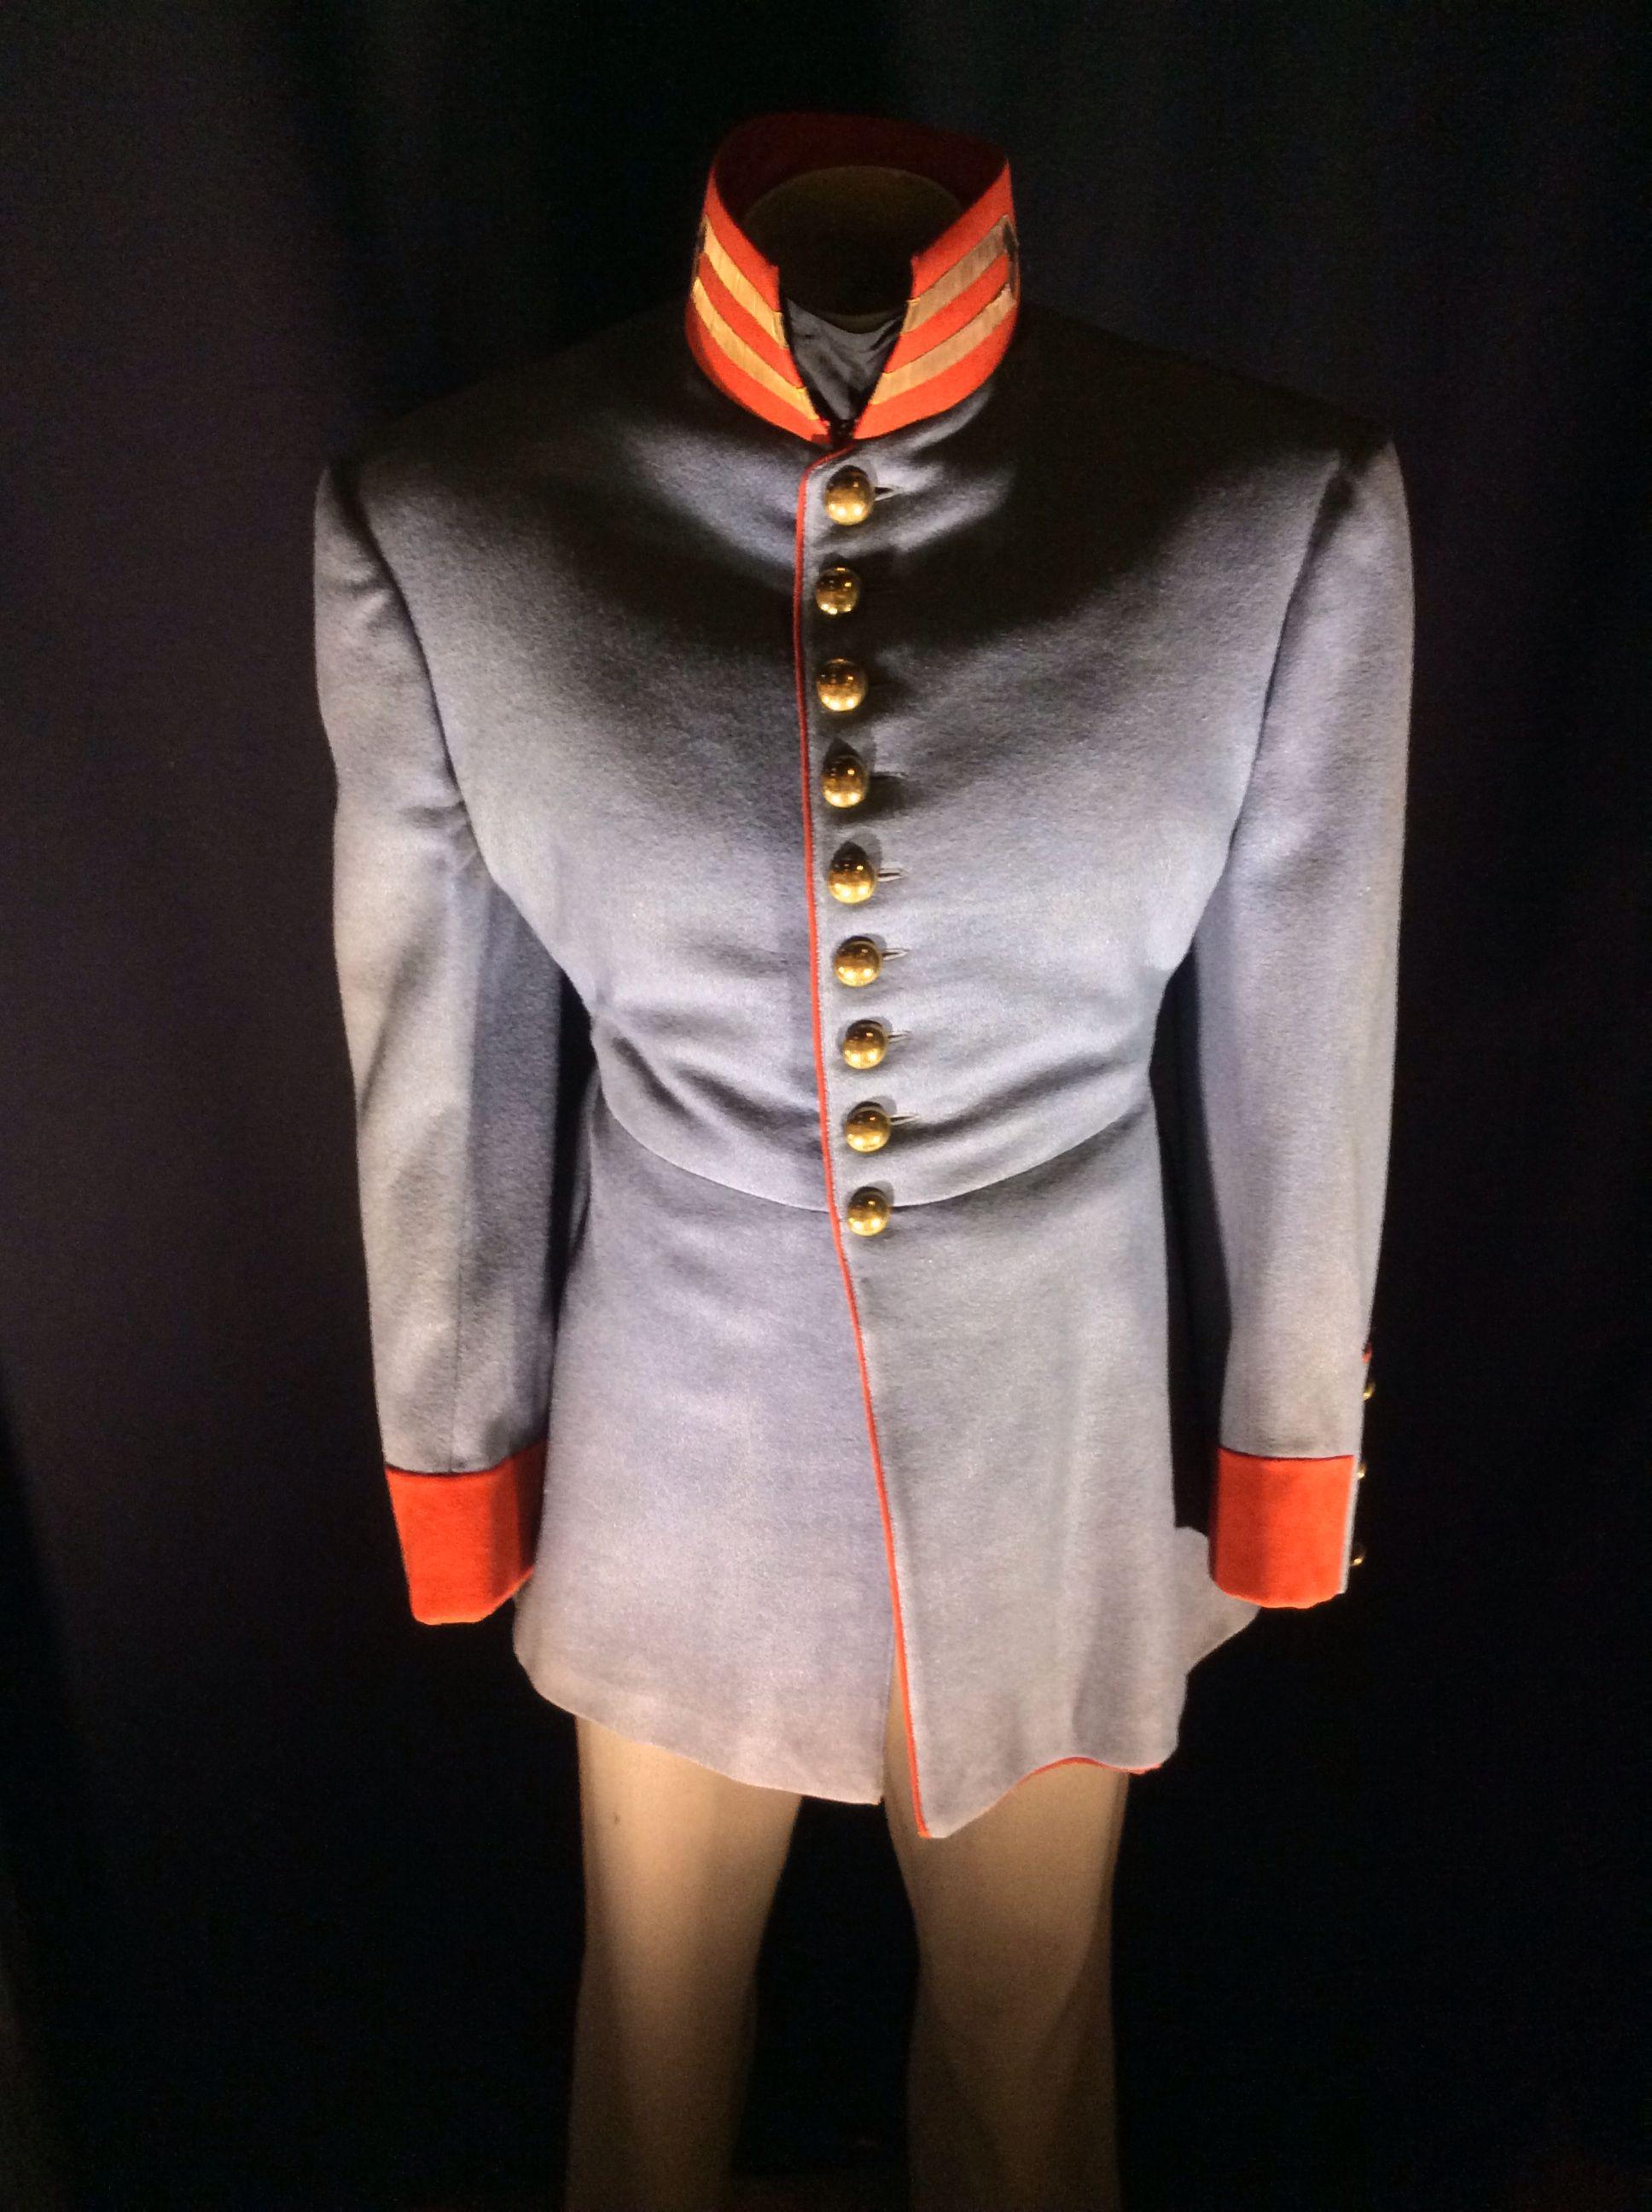 Gone with the Wind Atlanta Bazaar Uniform worn by an extra.